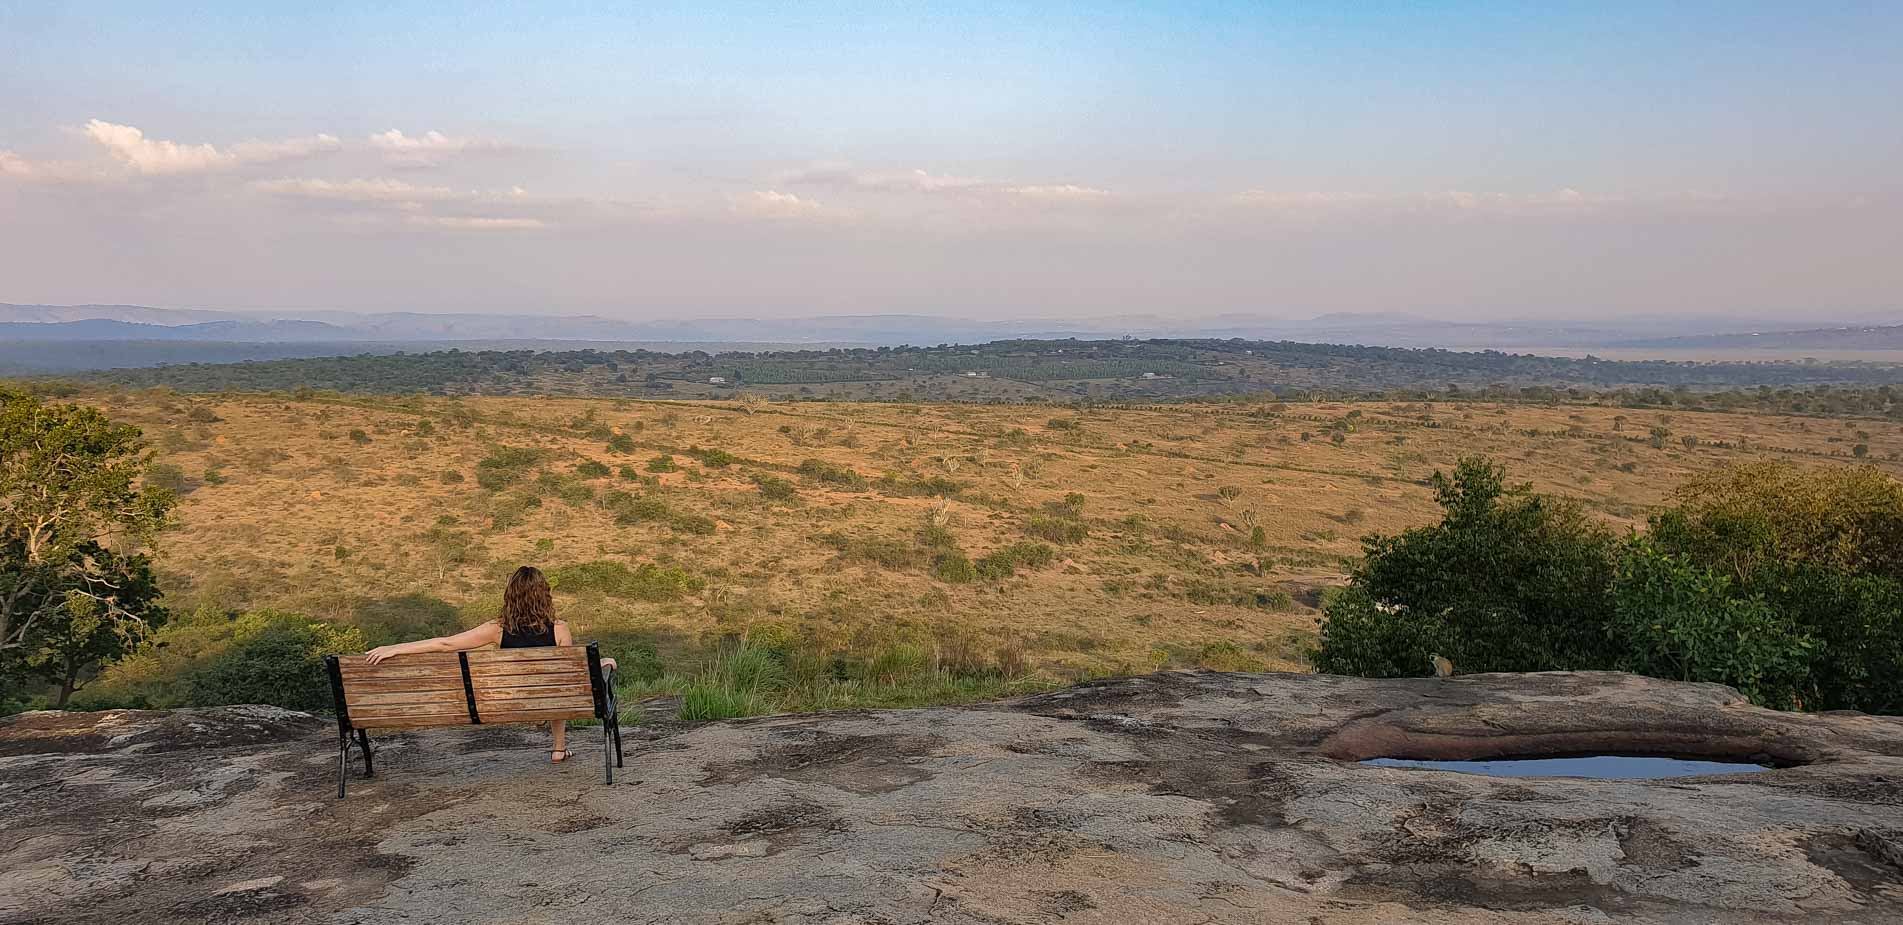 lago mburo uganda vistas (2)